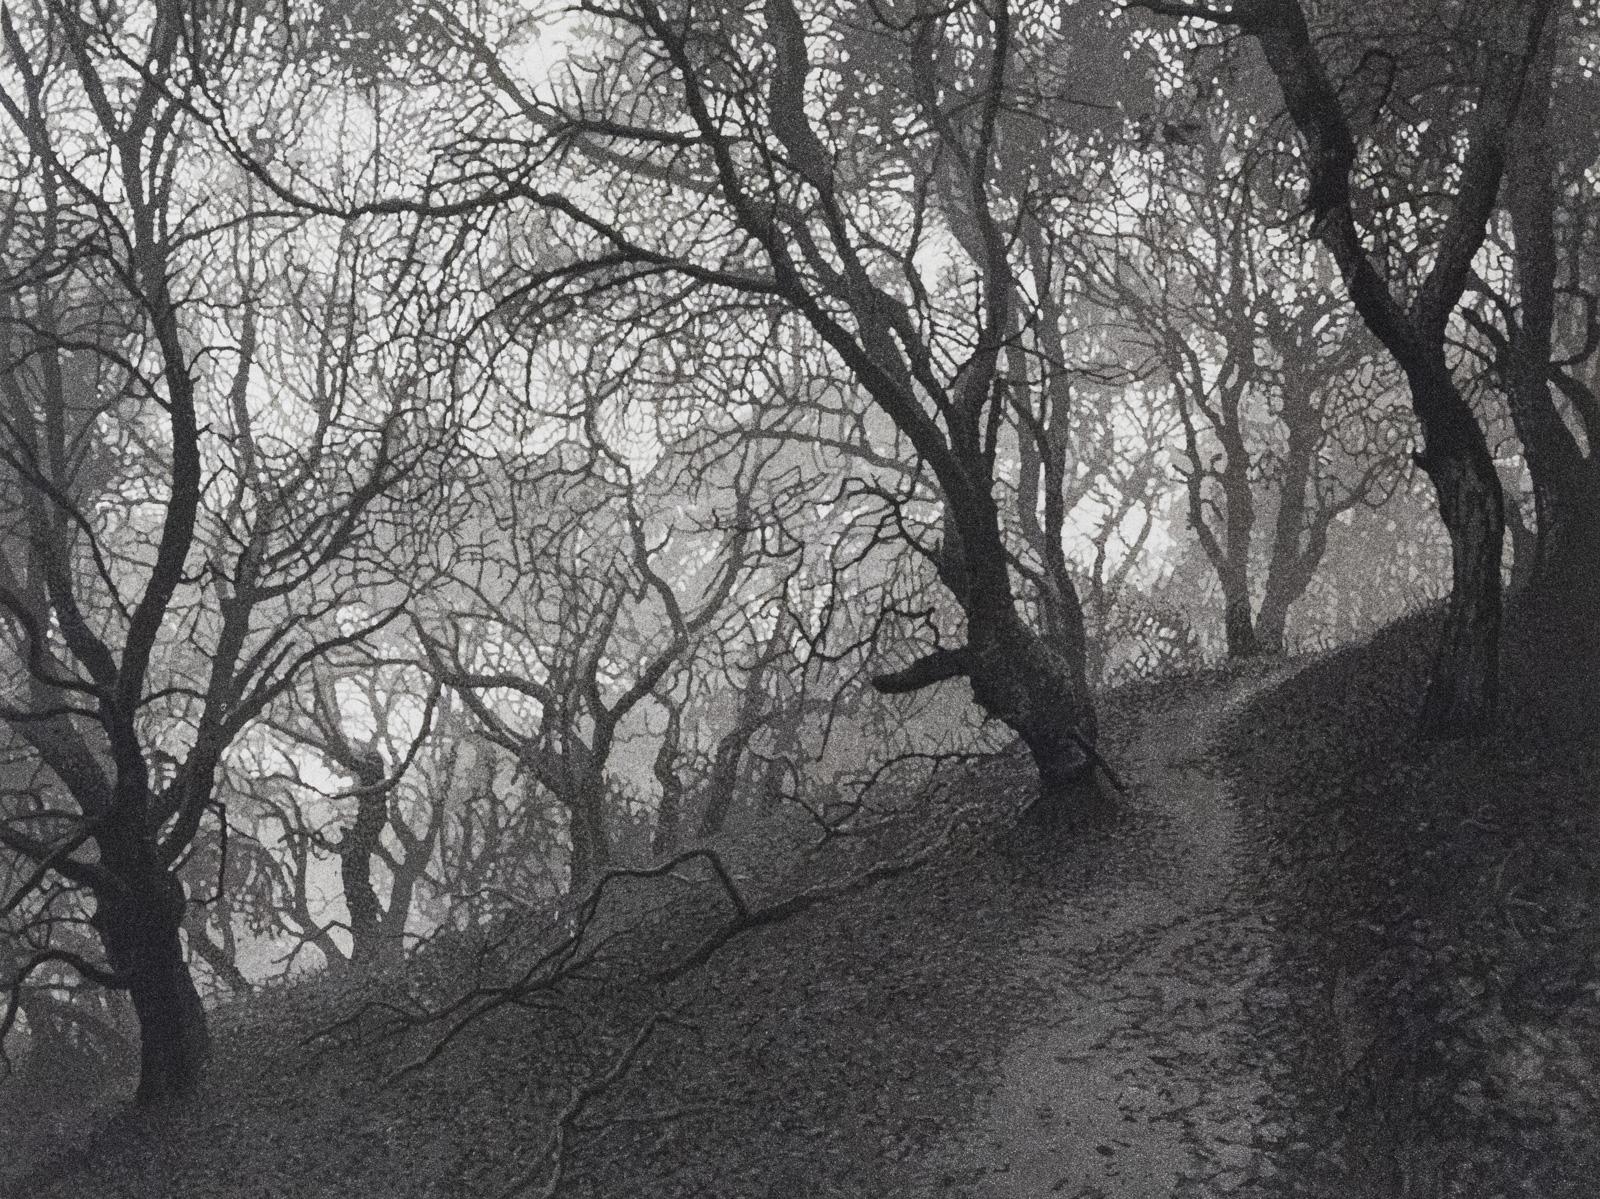 Oak Path, 1 plate edition